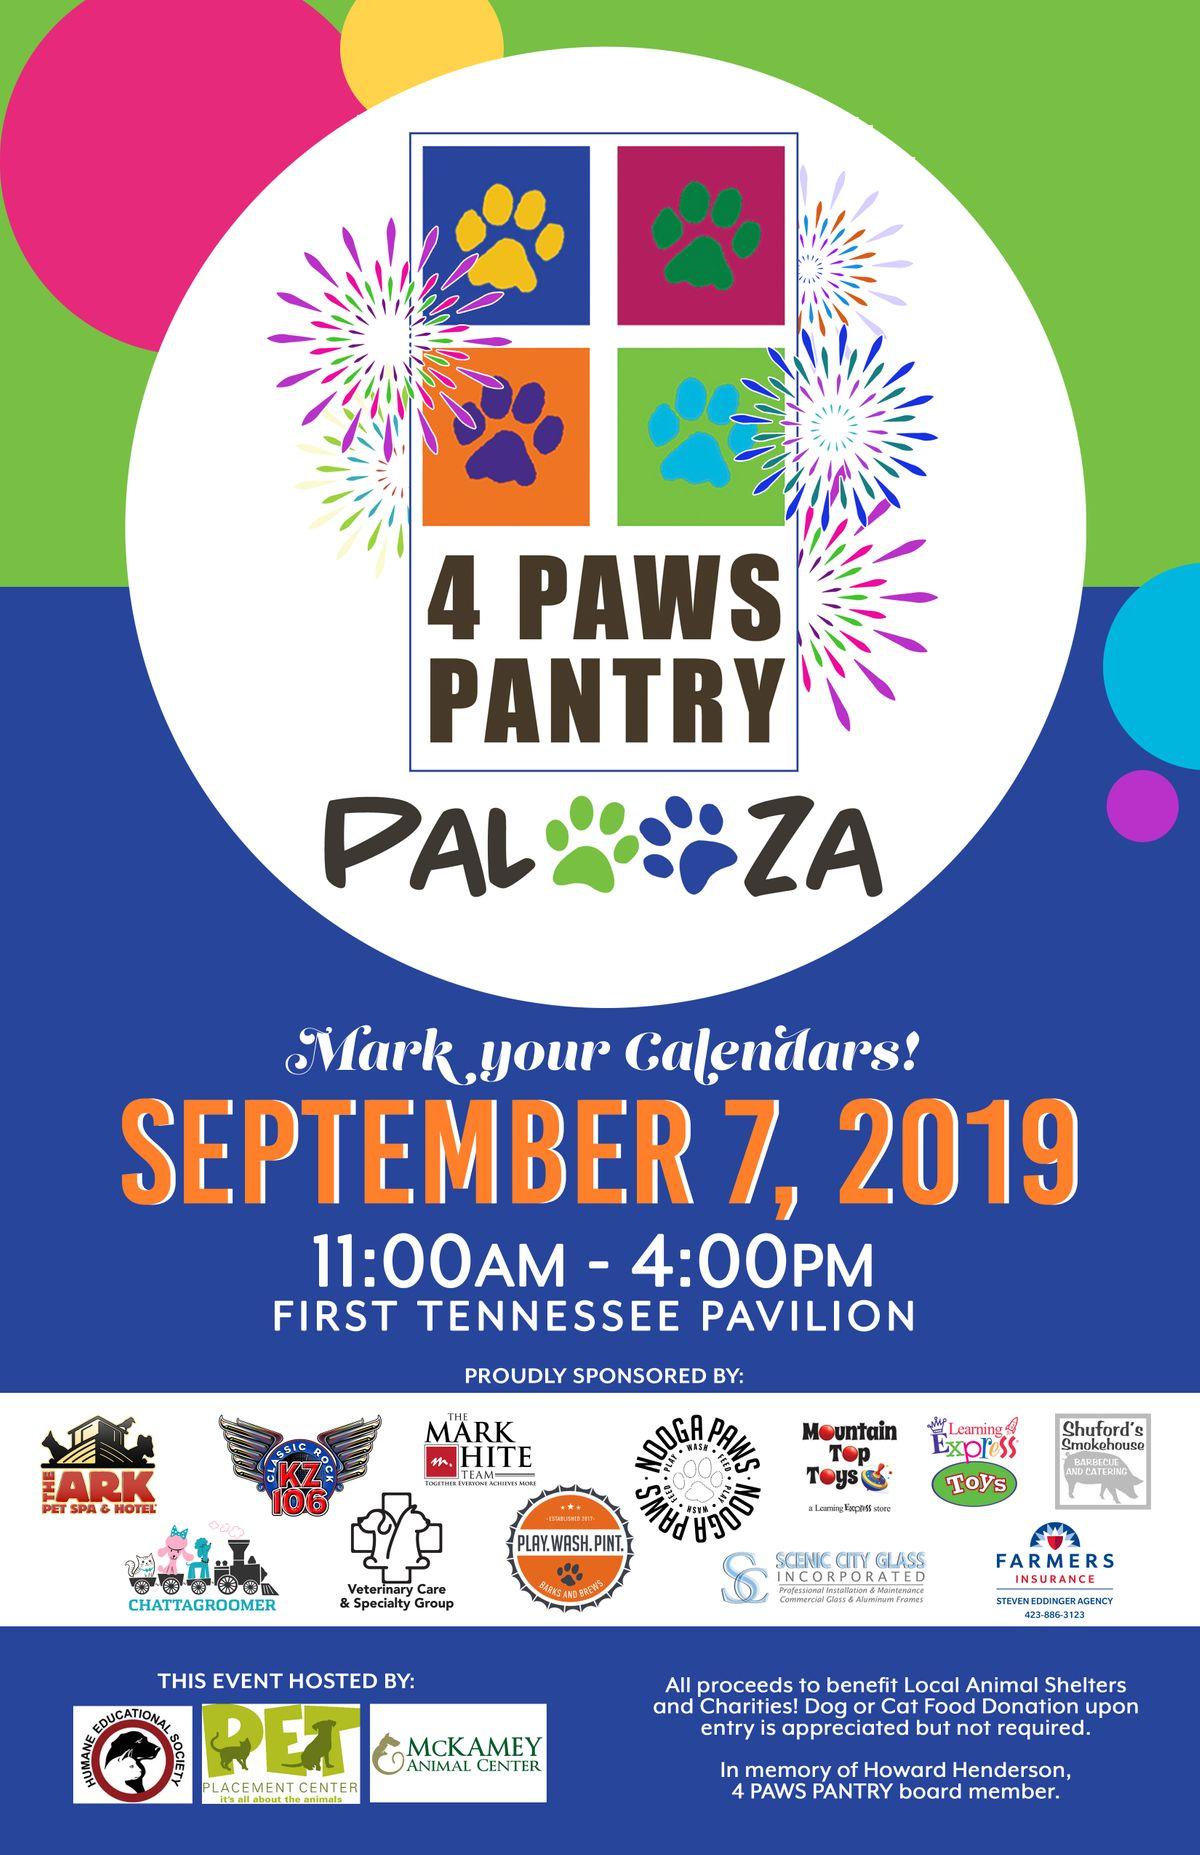 4 paws pantry palooza poster2.jpg